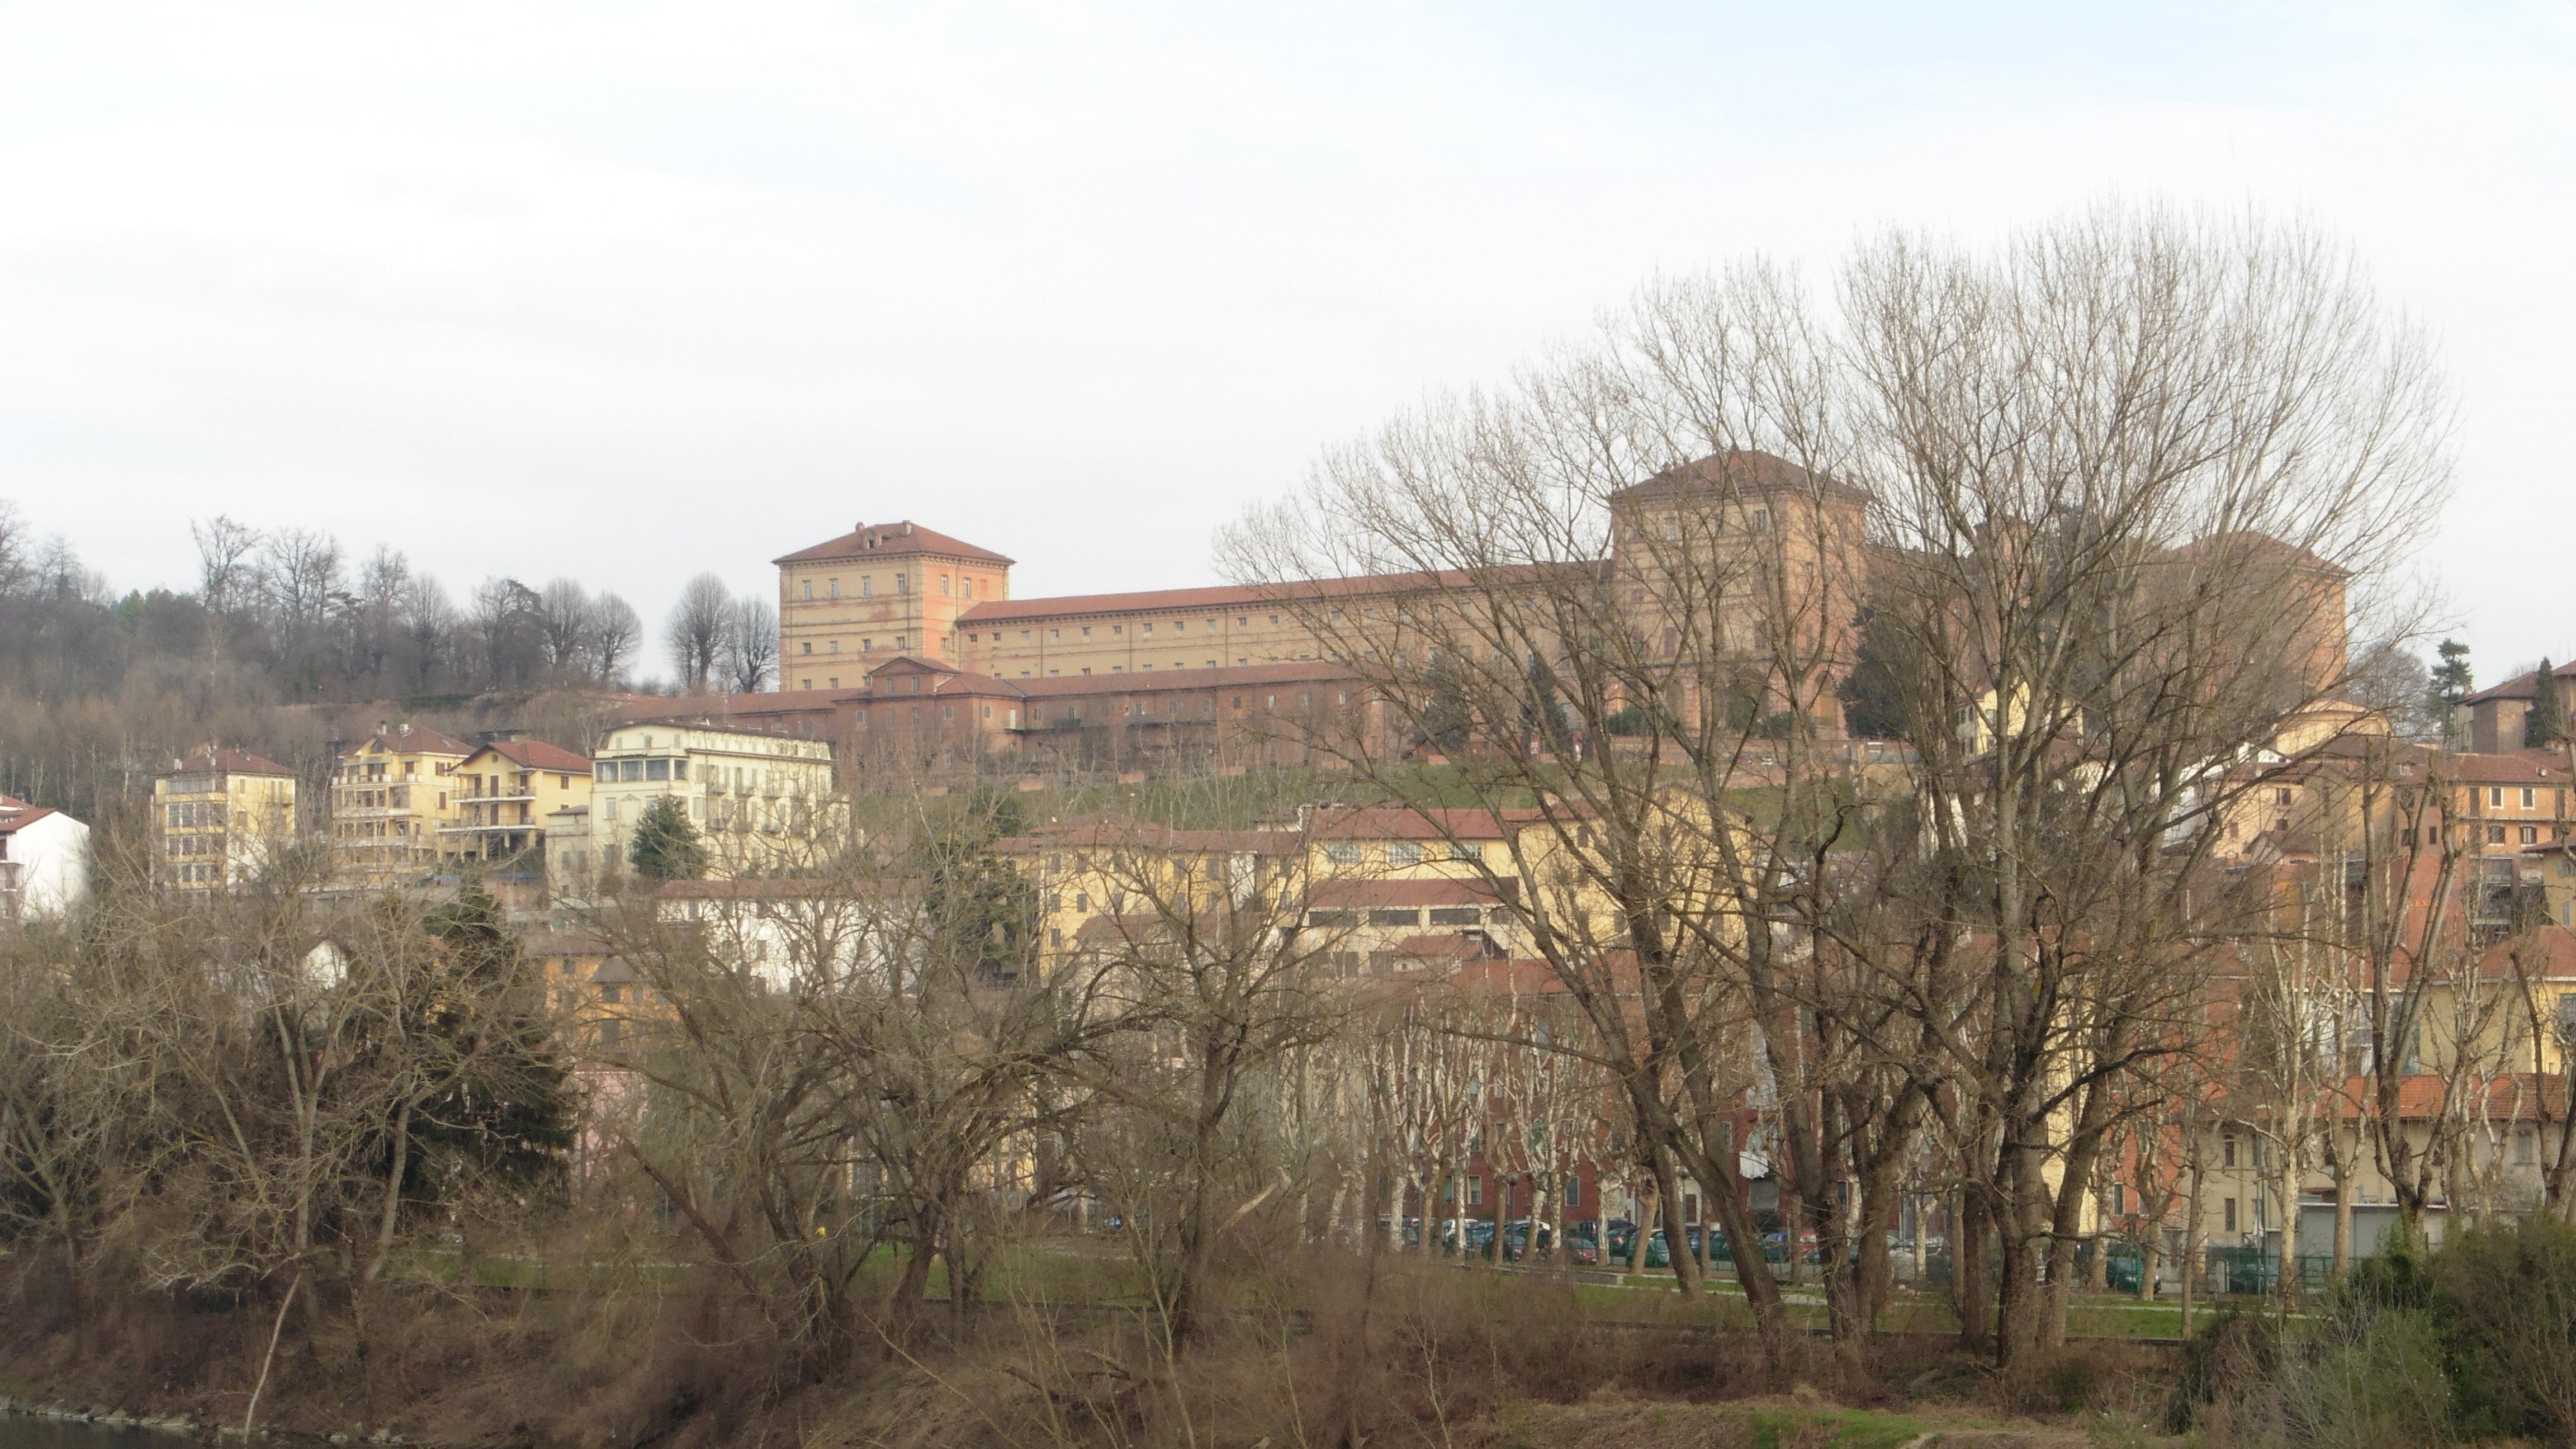 Castello Moncalieri